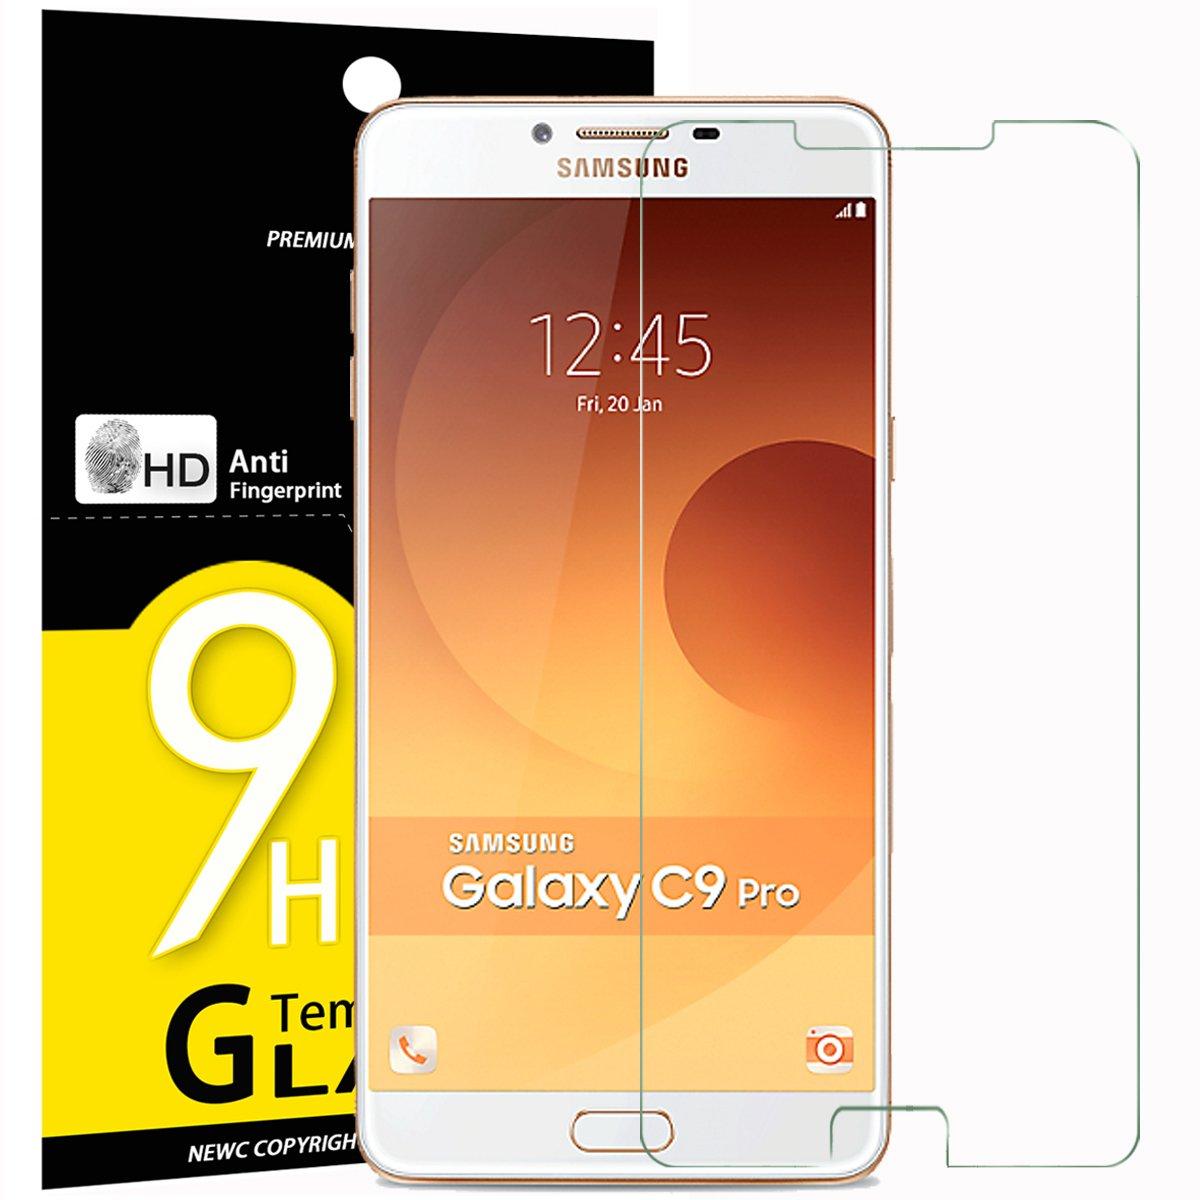 Verre Tremp Samsung Galaxy C9 Pro C9000 Newc Film Protection En C900 Cran Protecteur Vitre High Tech